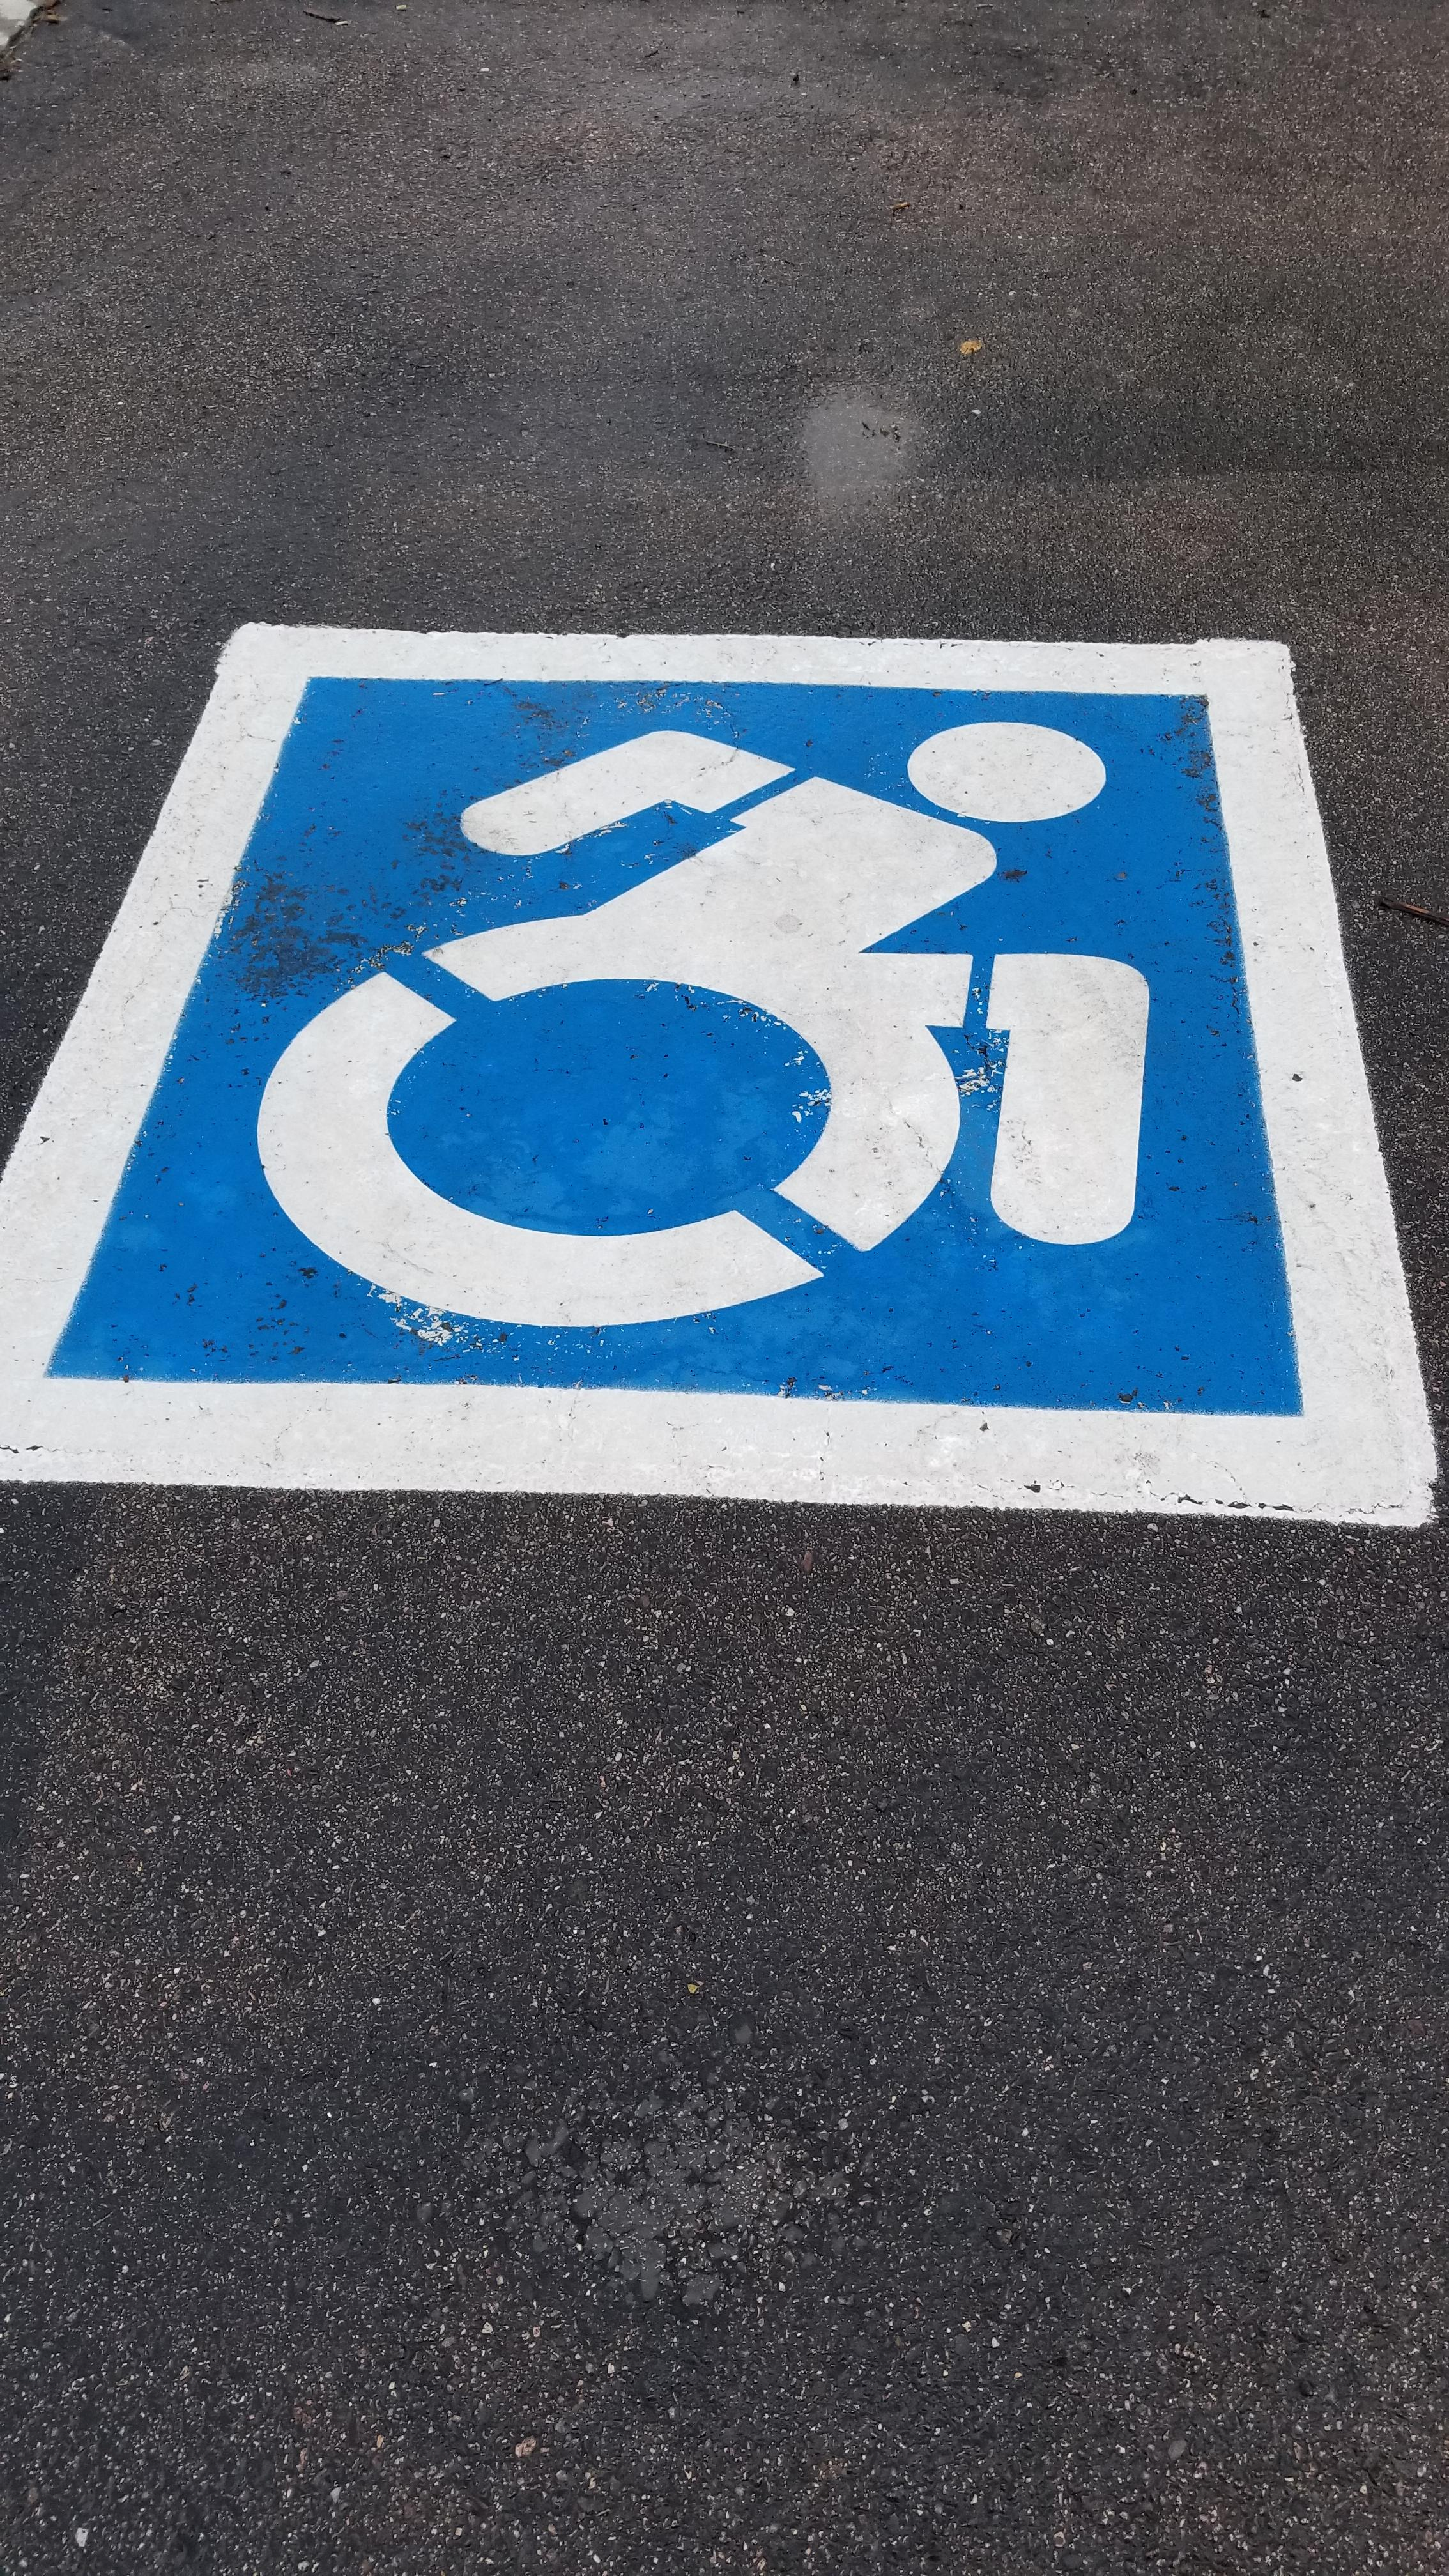 [Image] Motivational handi-parking